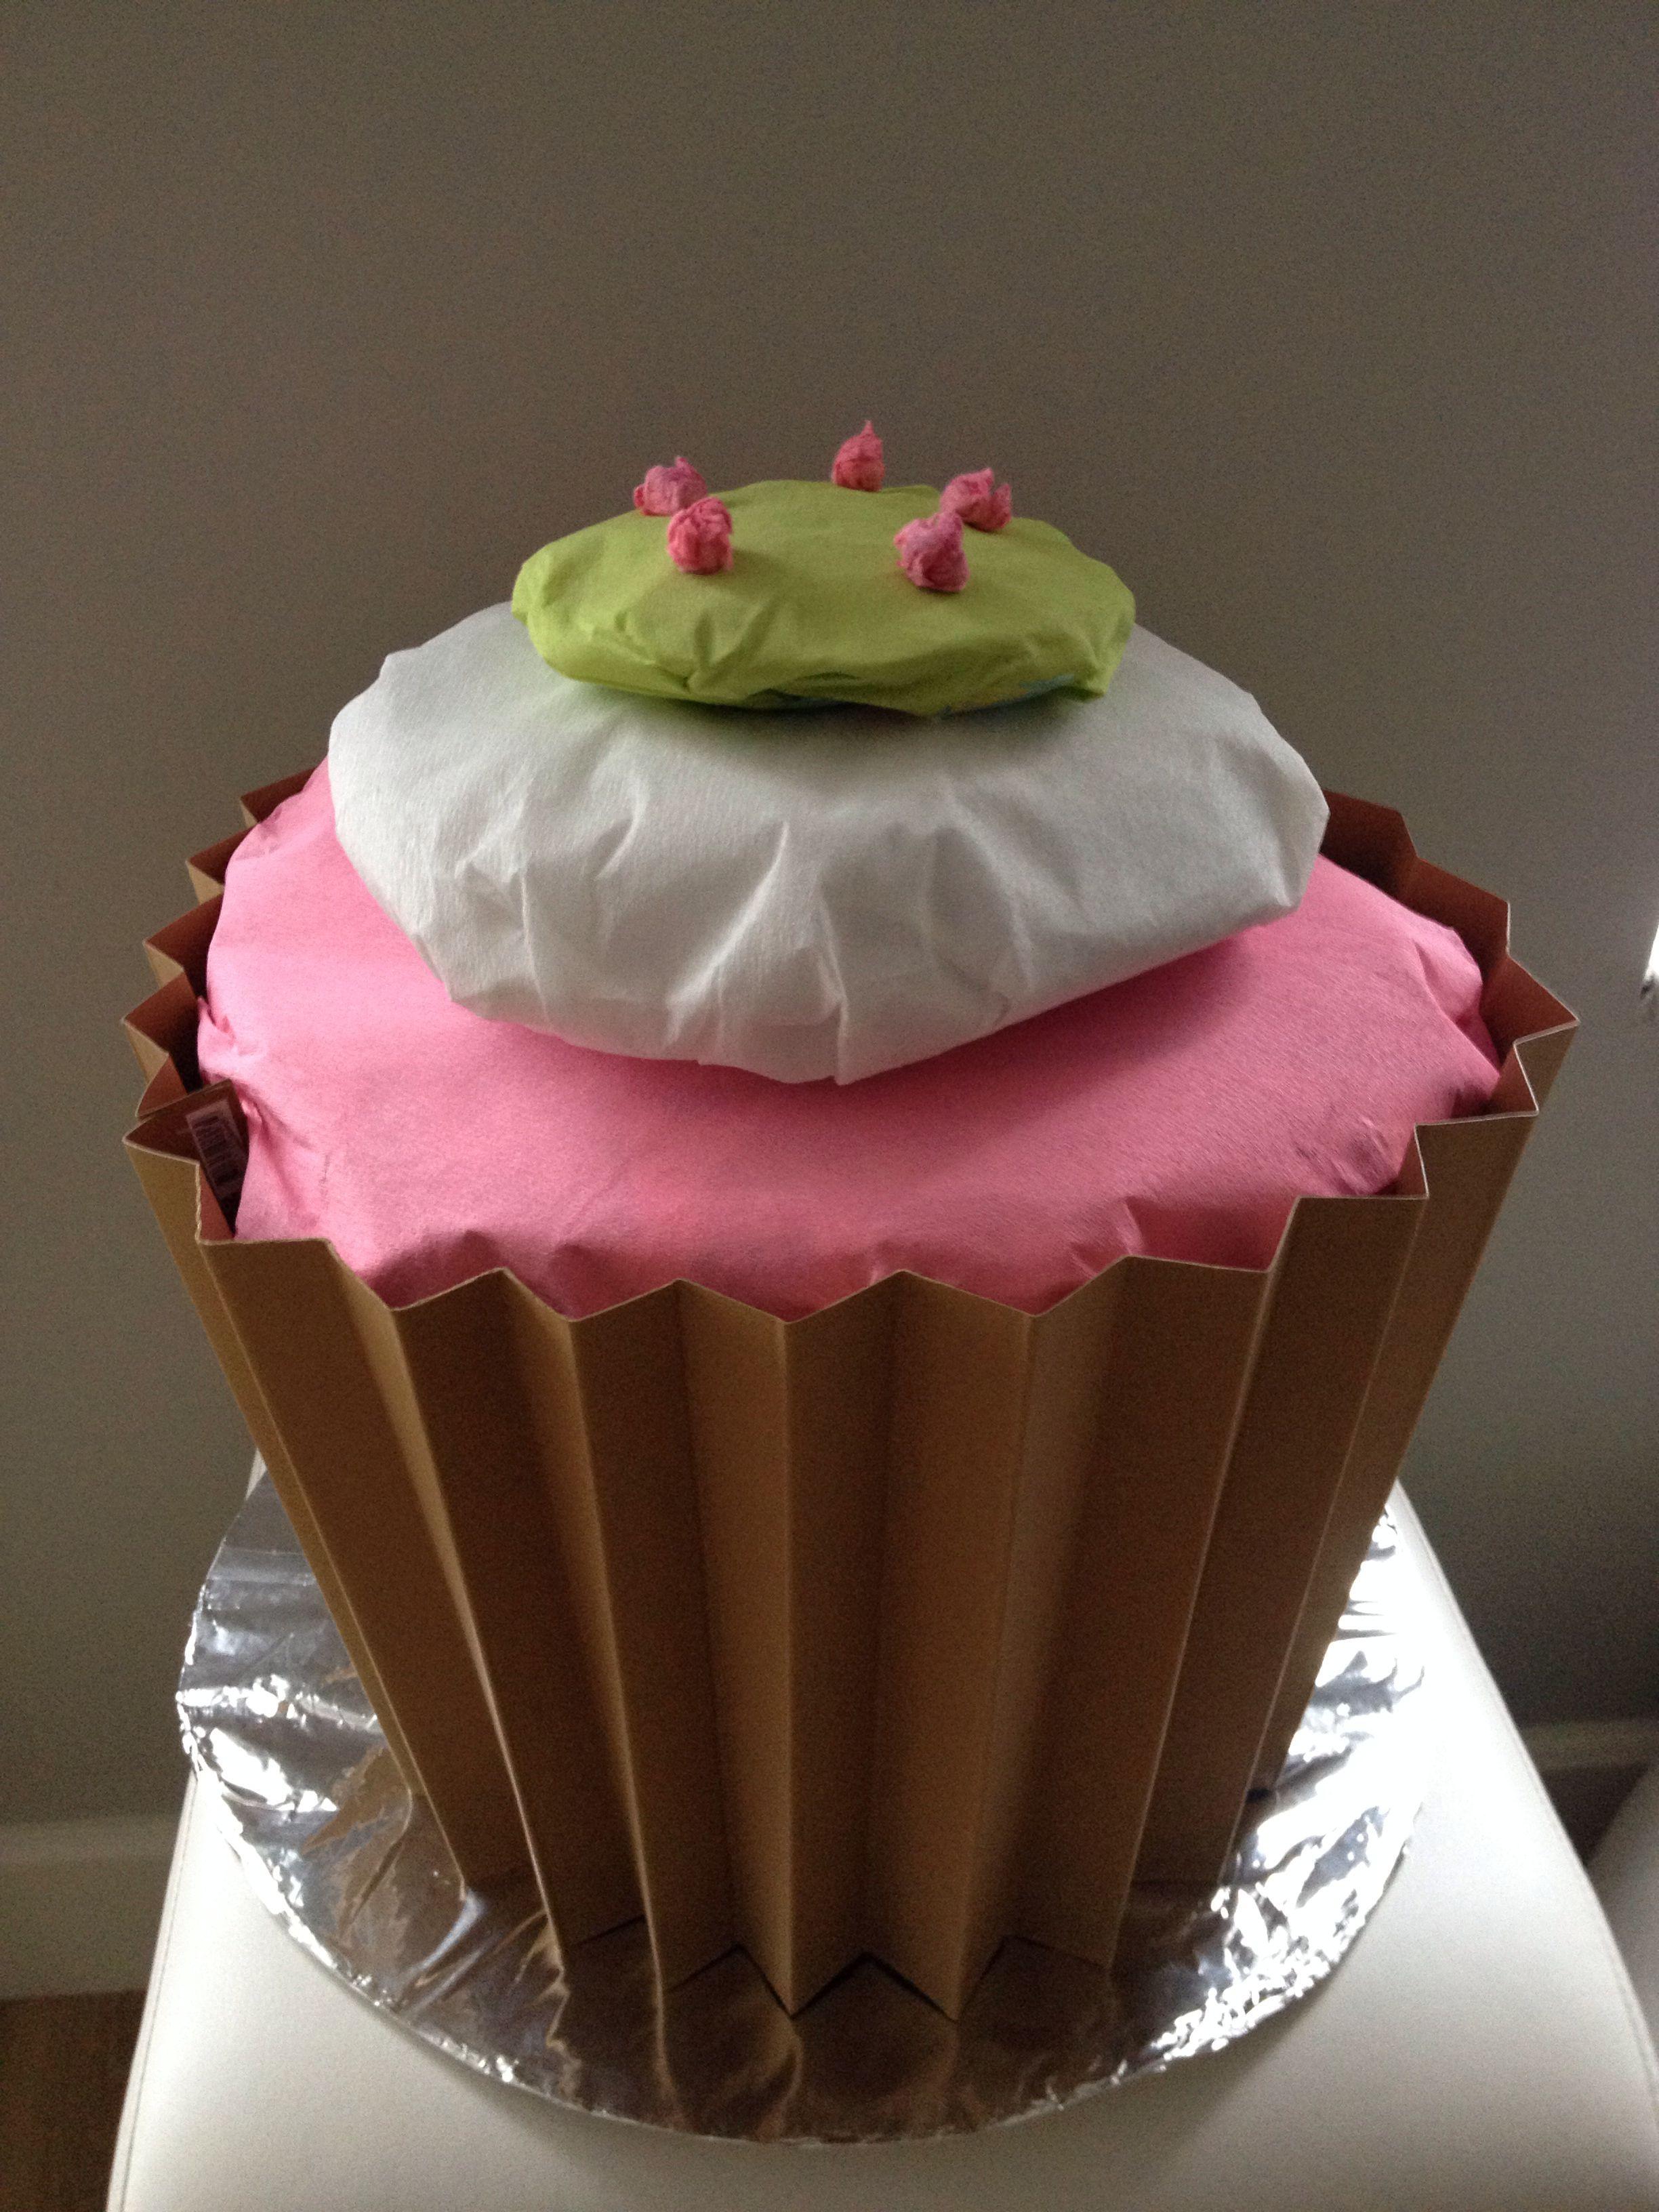 grote cupcake maken